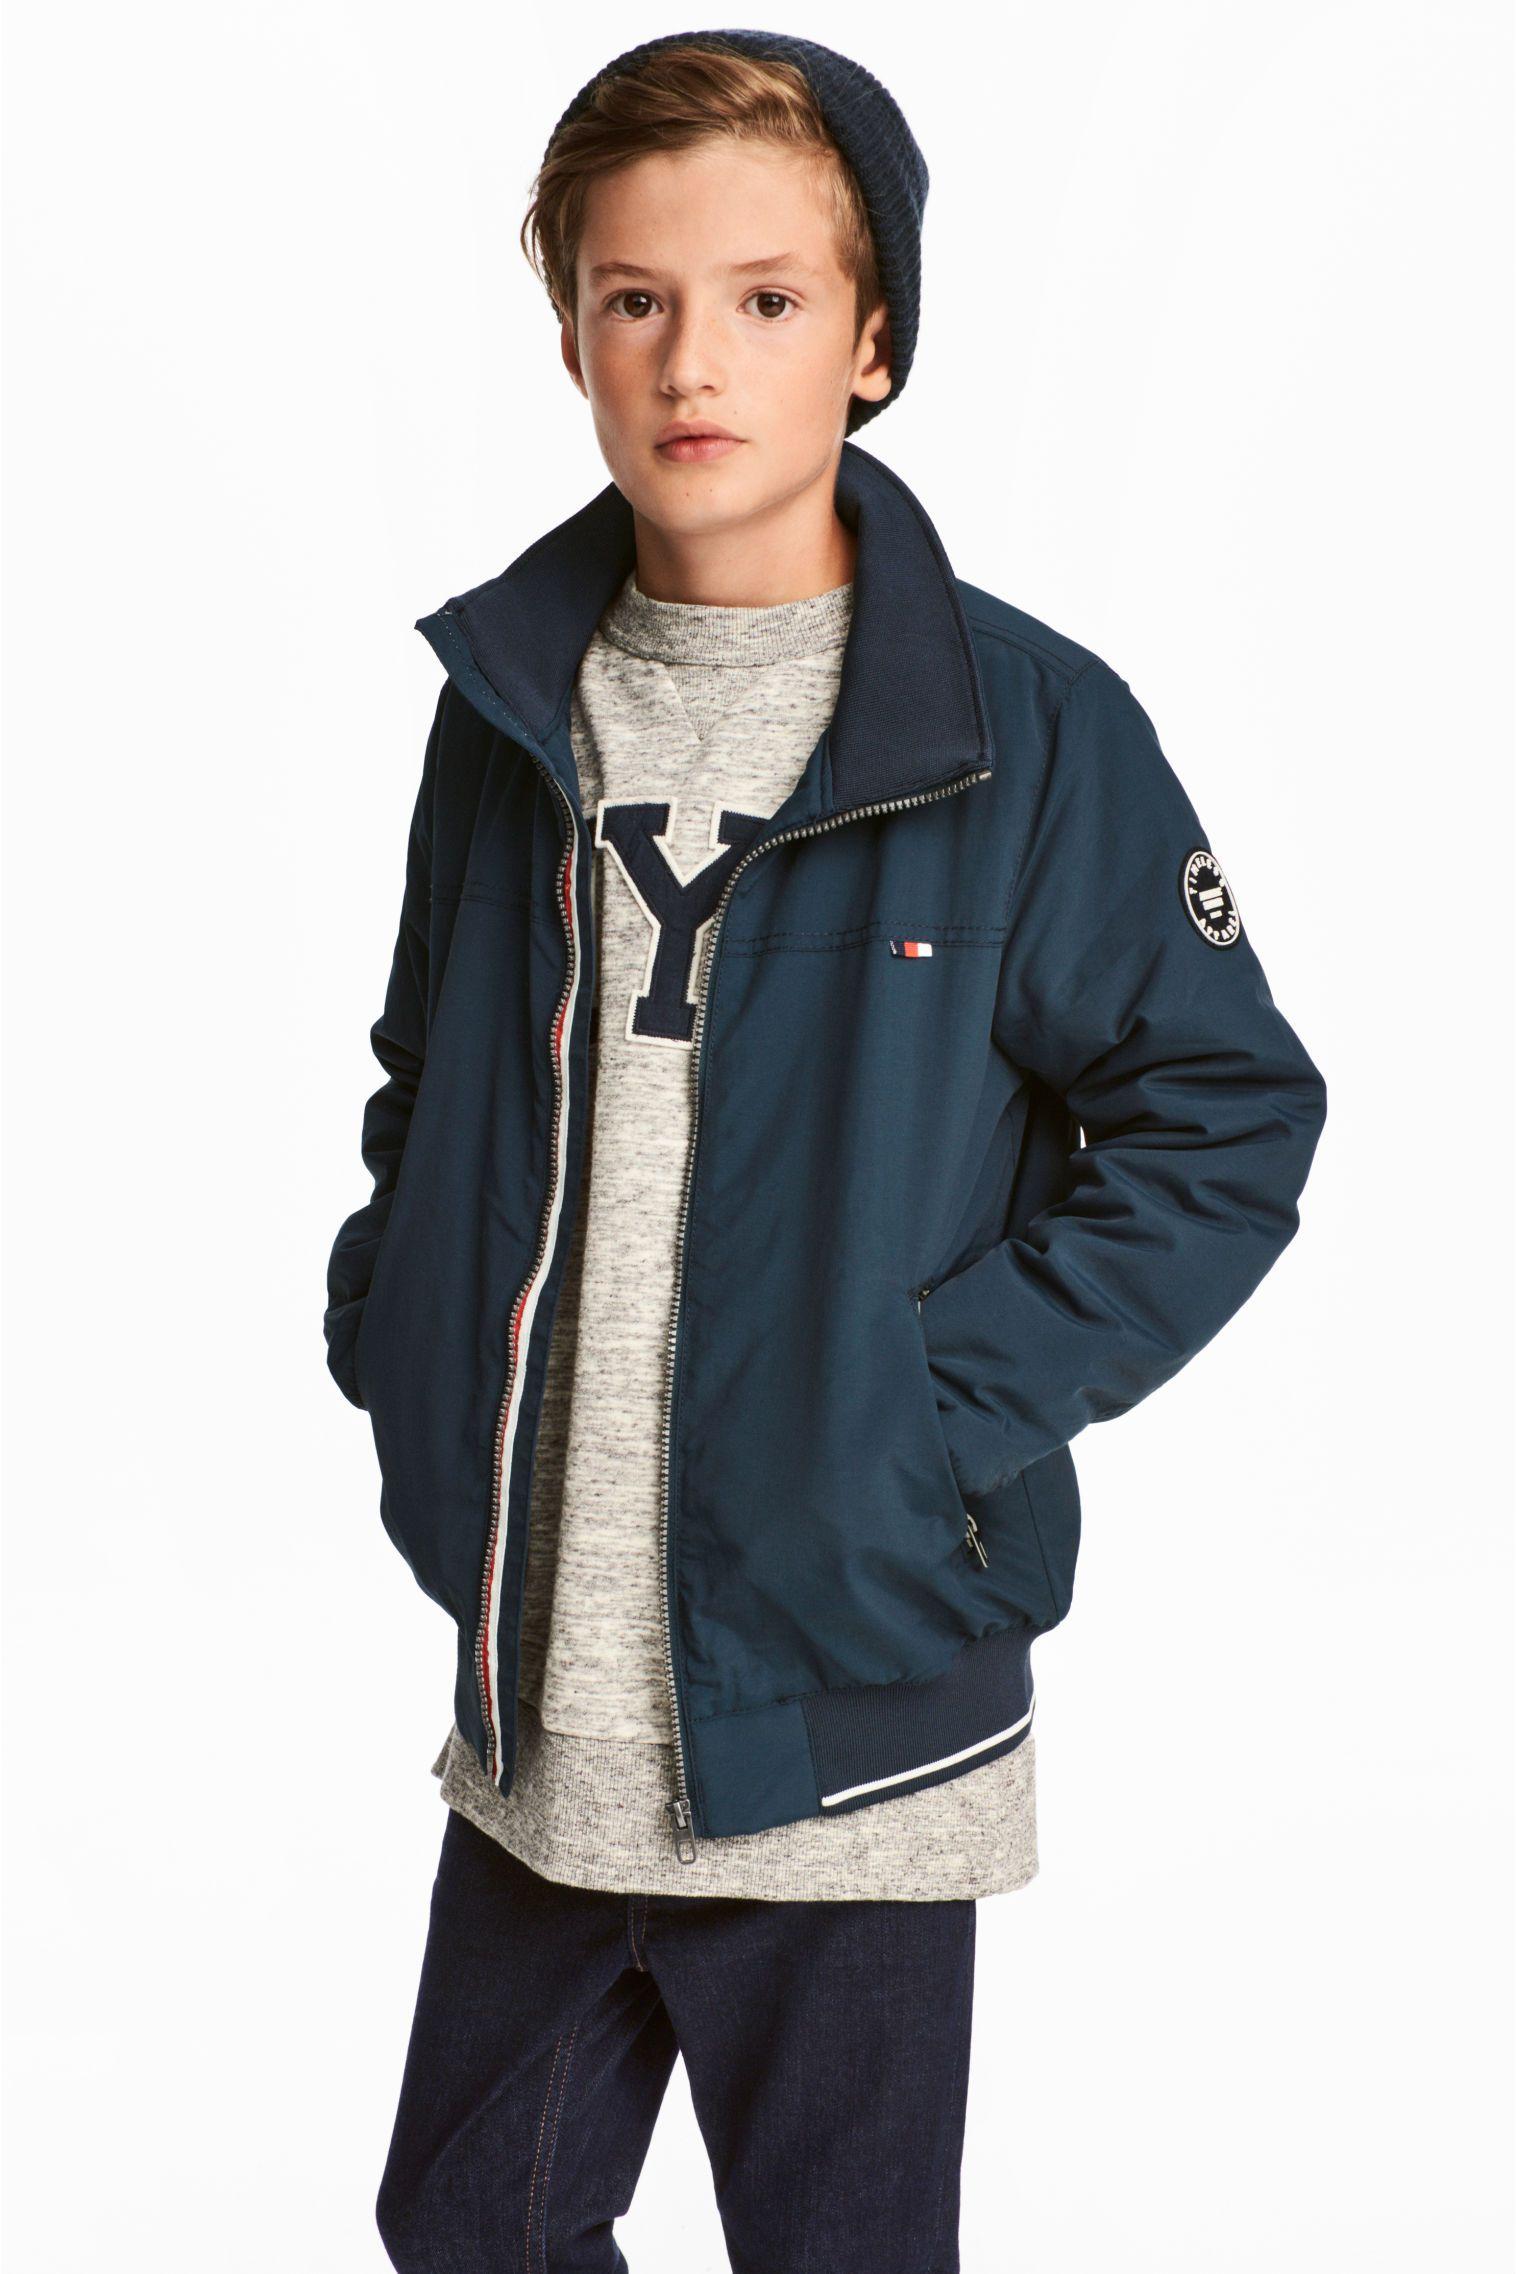 7bbd4be92a62 H M Boy Clothing